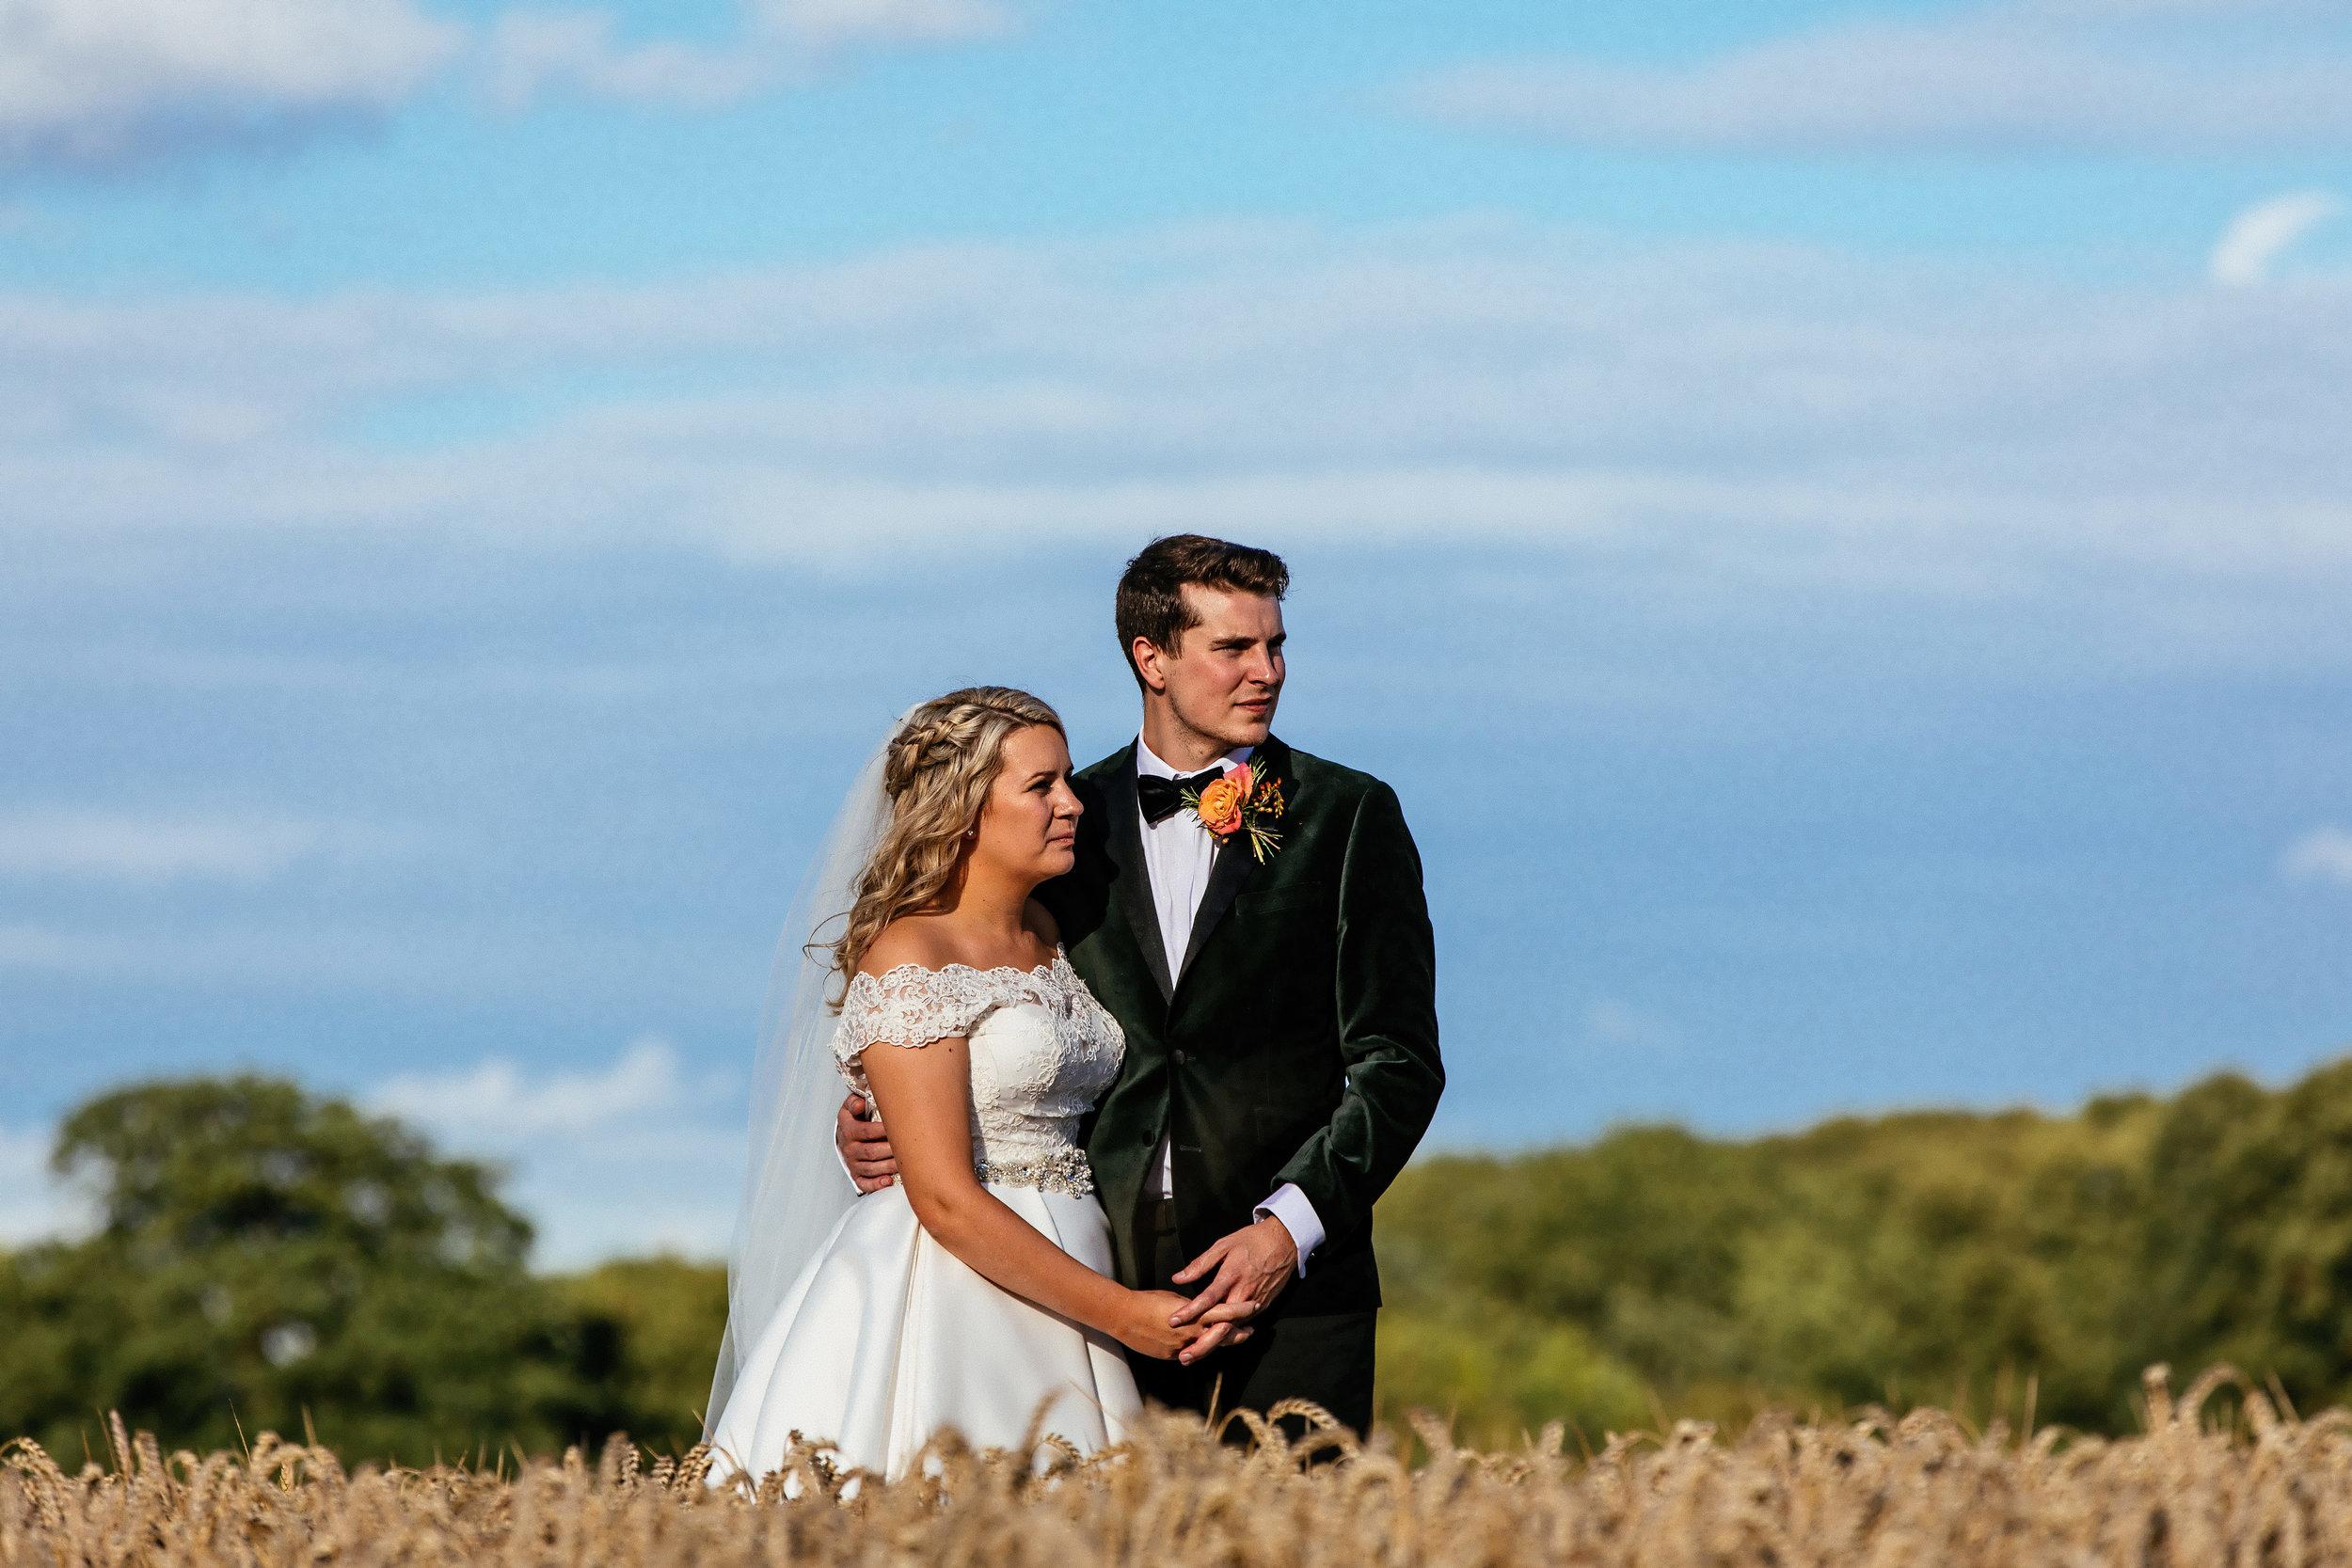 Tamara-and-Richard-Wedding-Highlights-82.jpg